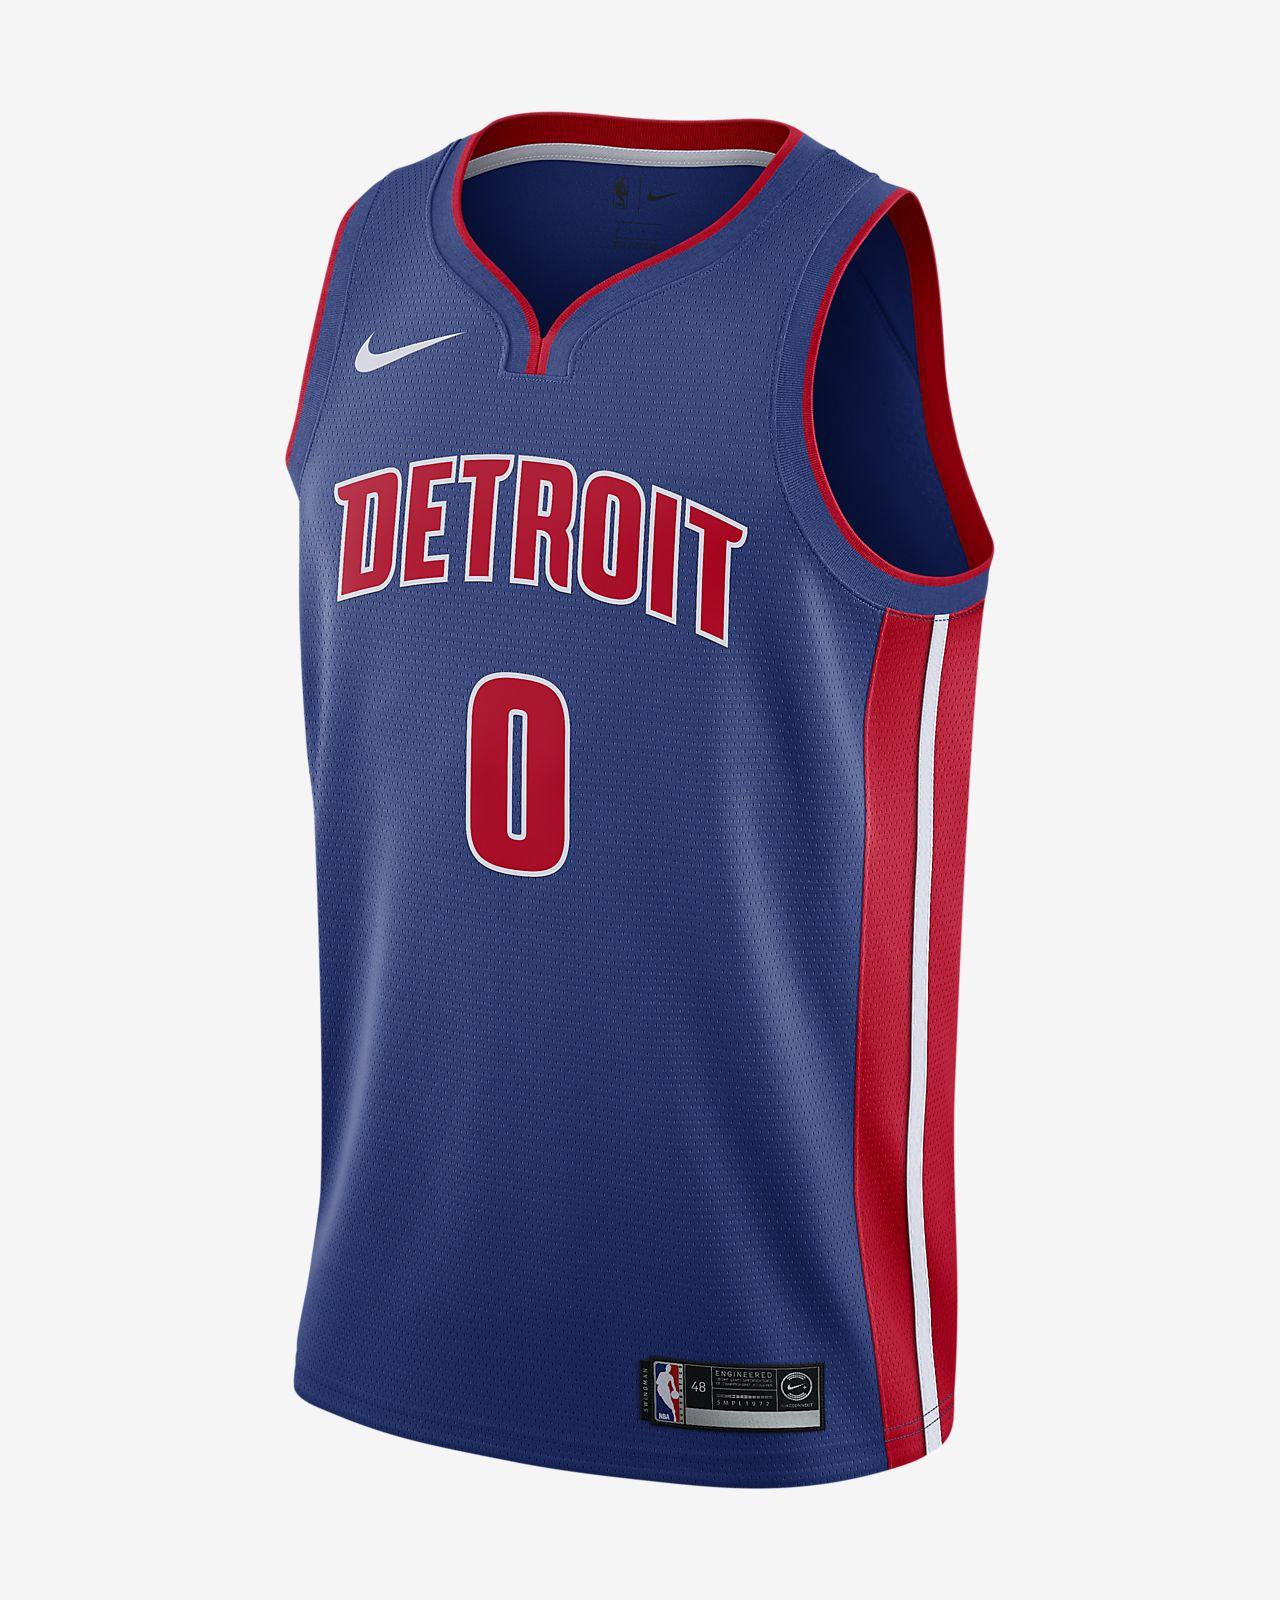 Camiseta conectada Nike NBA para hombre Andre Drummond Icon Edition Swingman (Detroit Pistons)